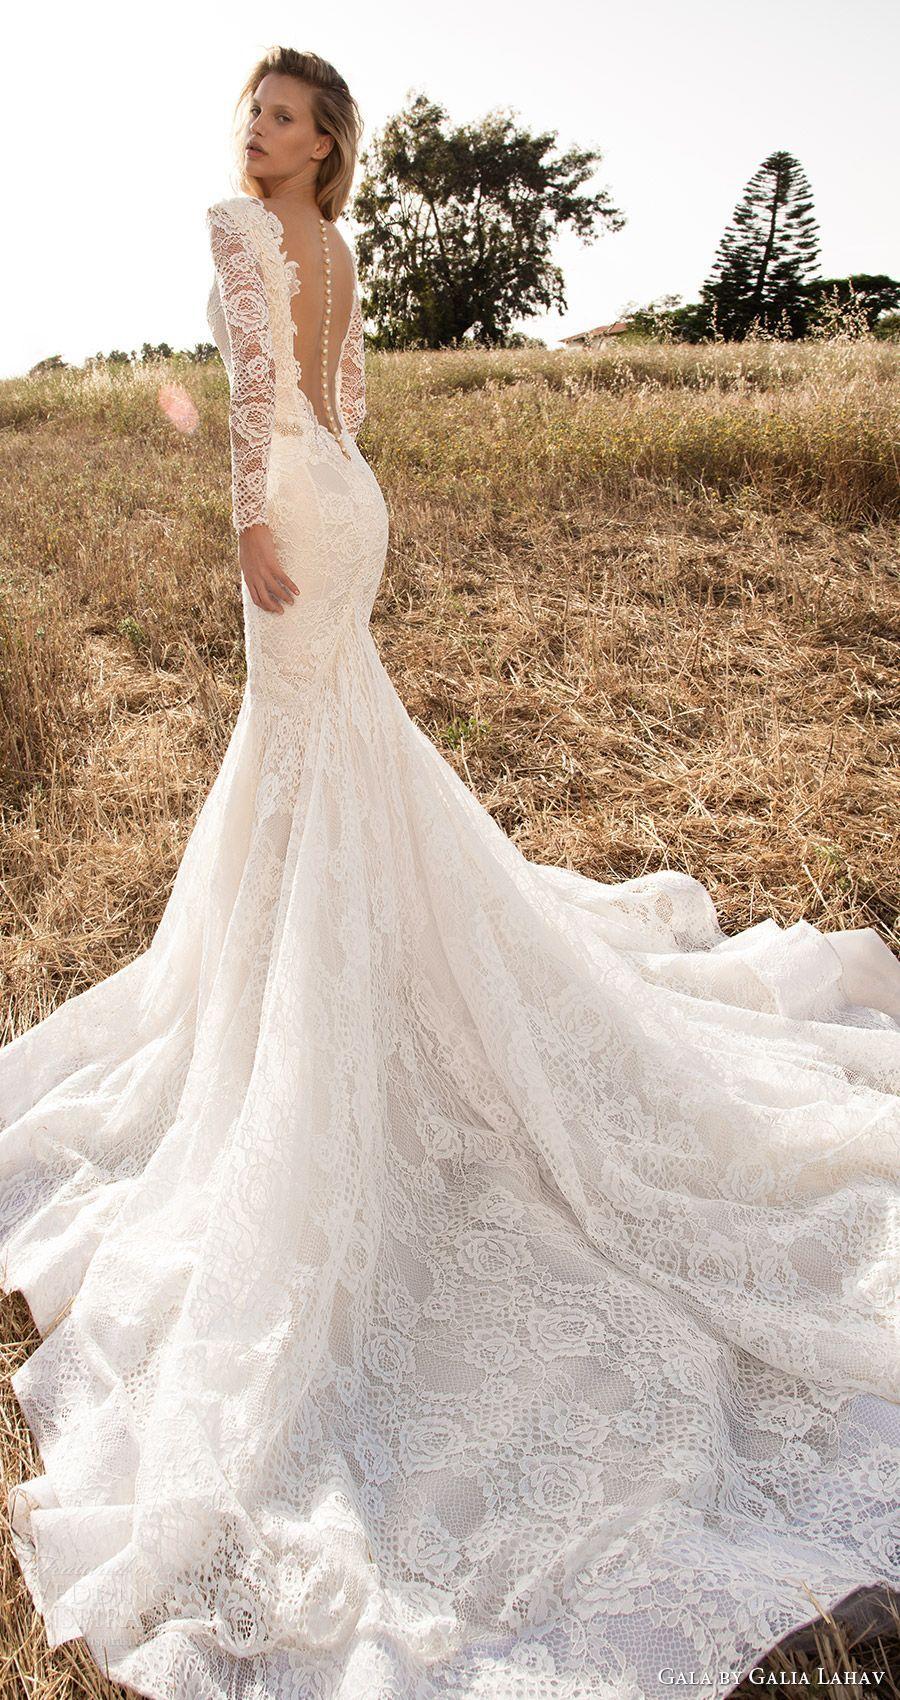 Gala By Galia Lahav Spring 2017 Wedding Dresses Gala No Ii Bridal Collection Lace Wedding Dresses Wedding Dresses Lace Weddings Long Wedding Dresses [ 1700 x 900 Pixel ]